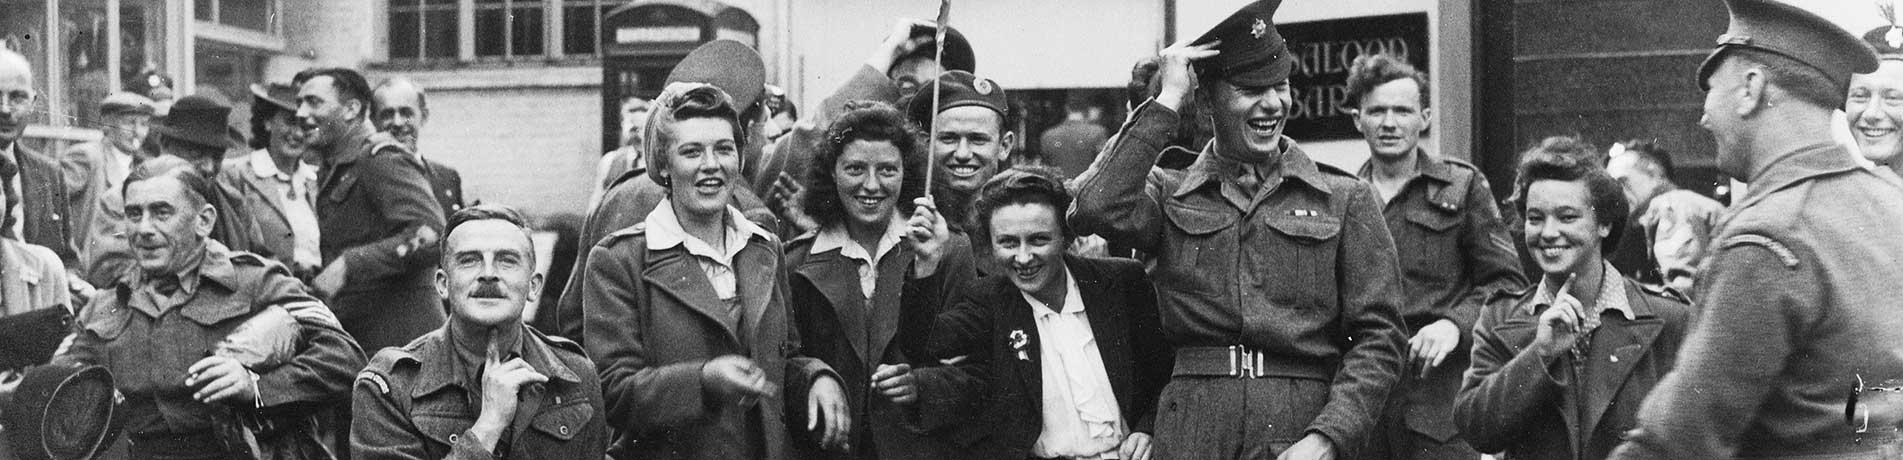 Slideshow image: World War II